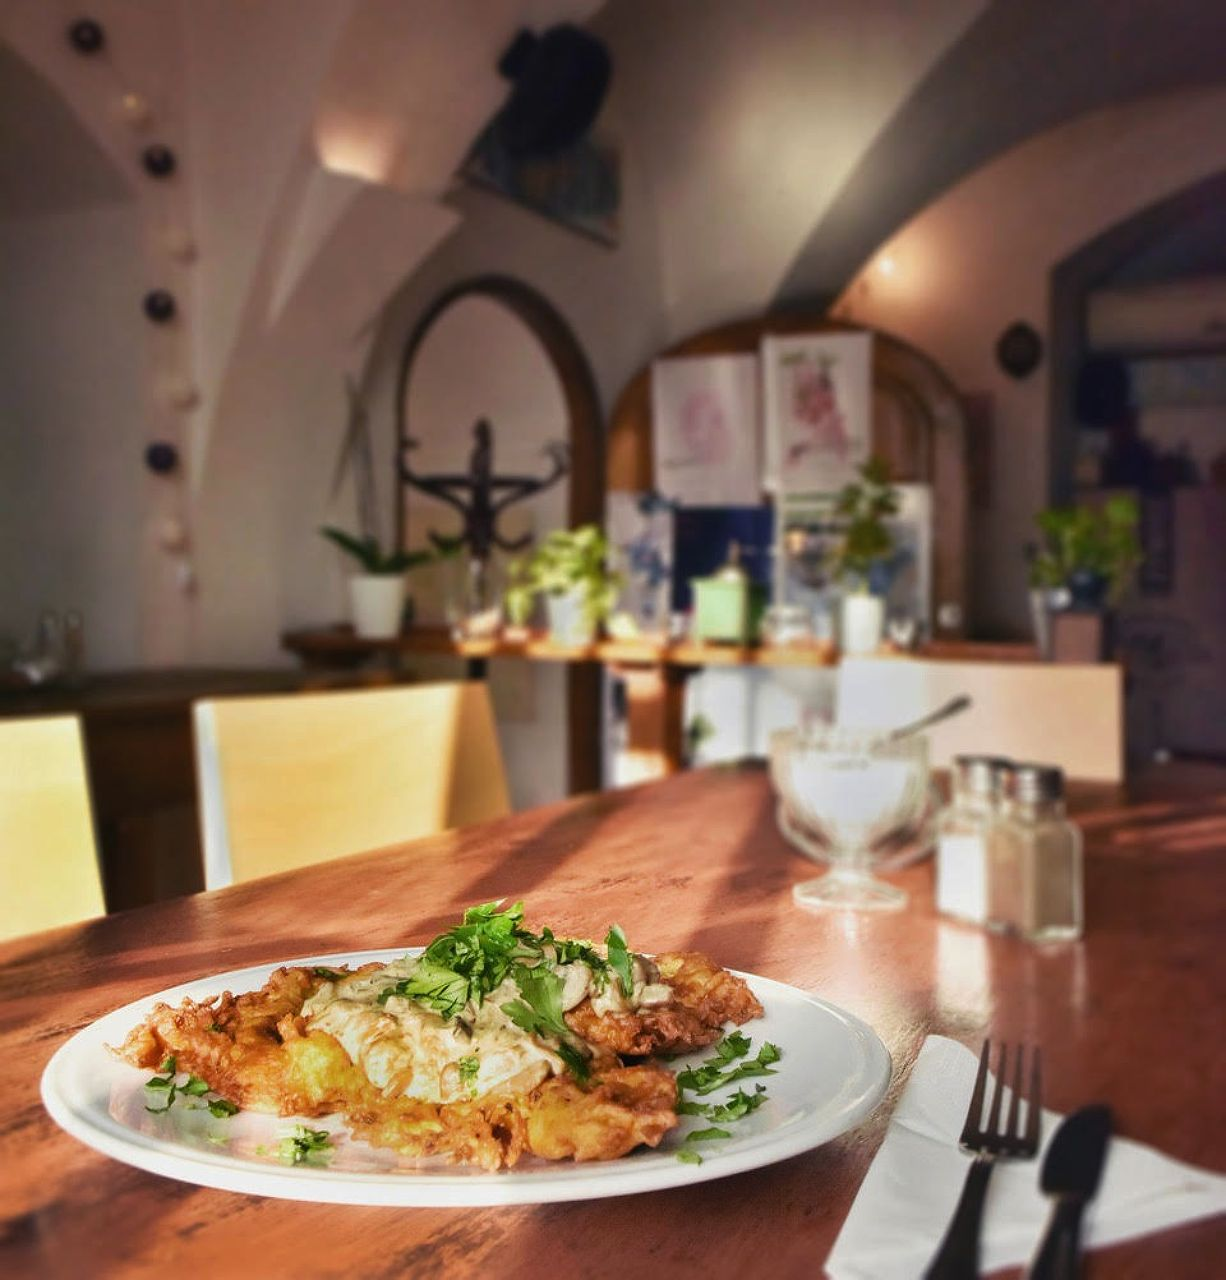 Photo 2 of Cafe Mlynek